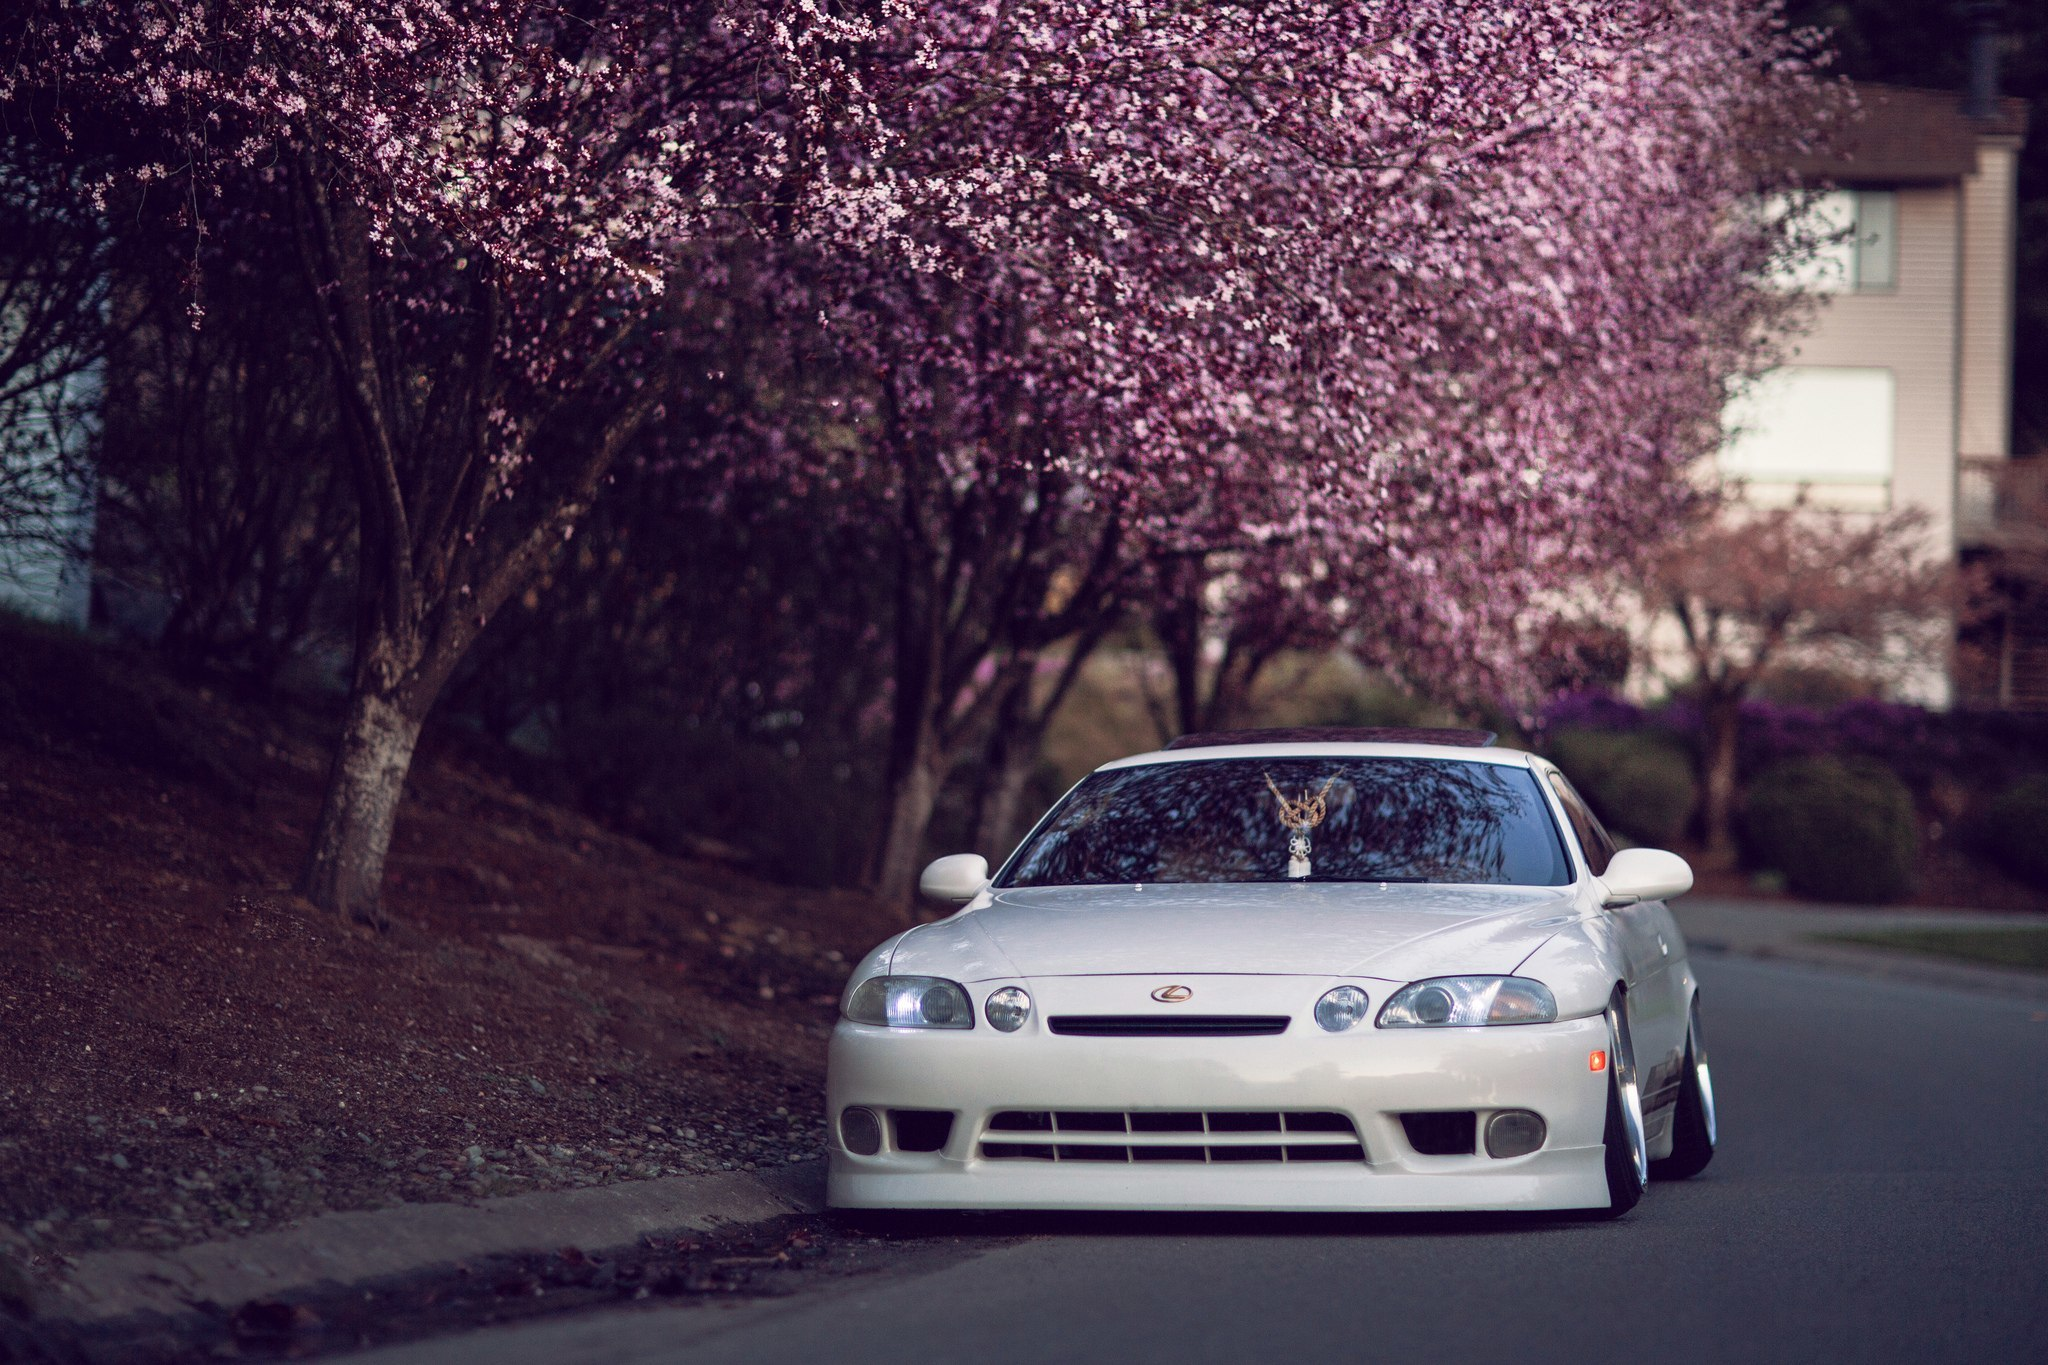 Alpha Coders Car Wallpapers Lexus Hd Wallpaper Background Image 2048x1365 Id